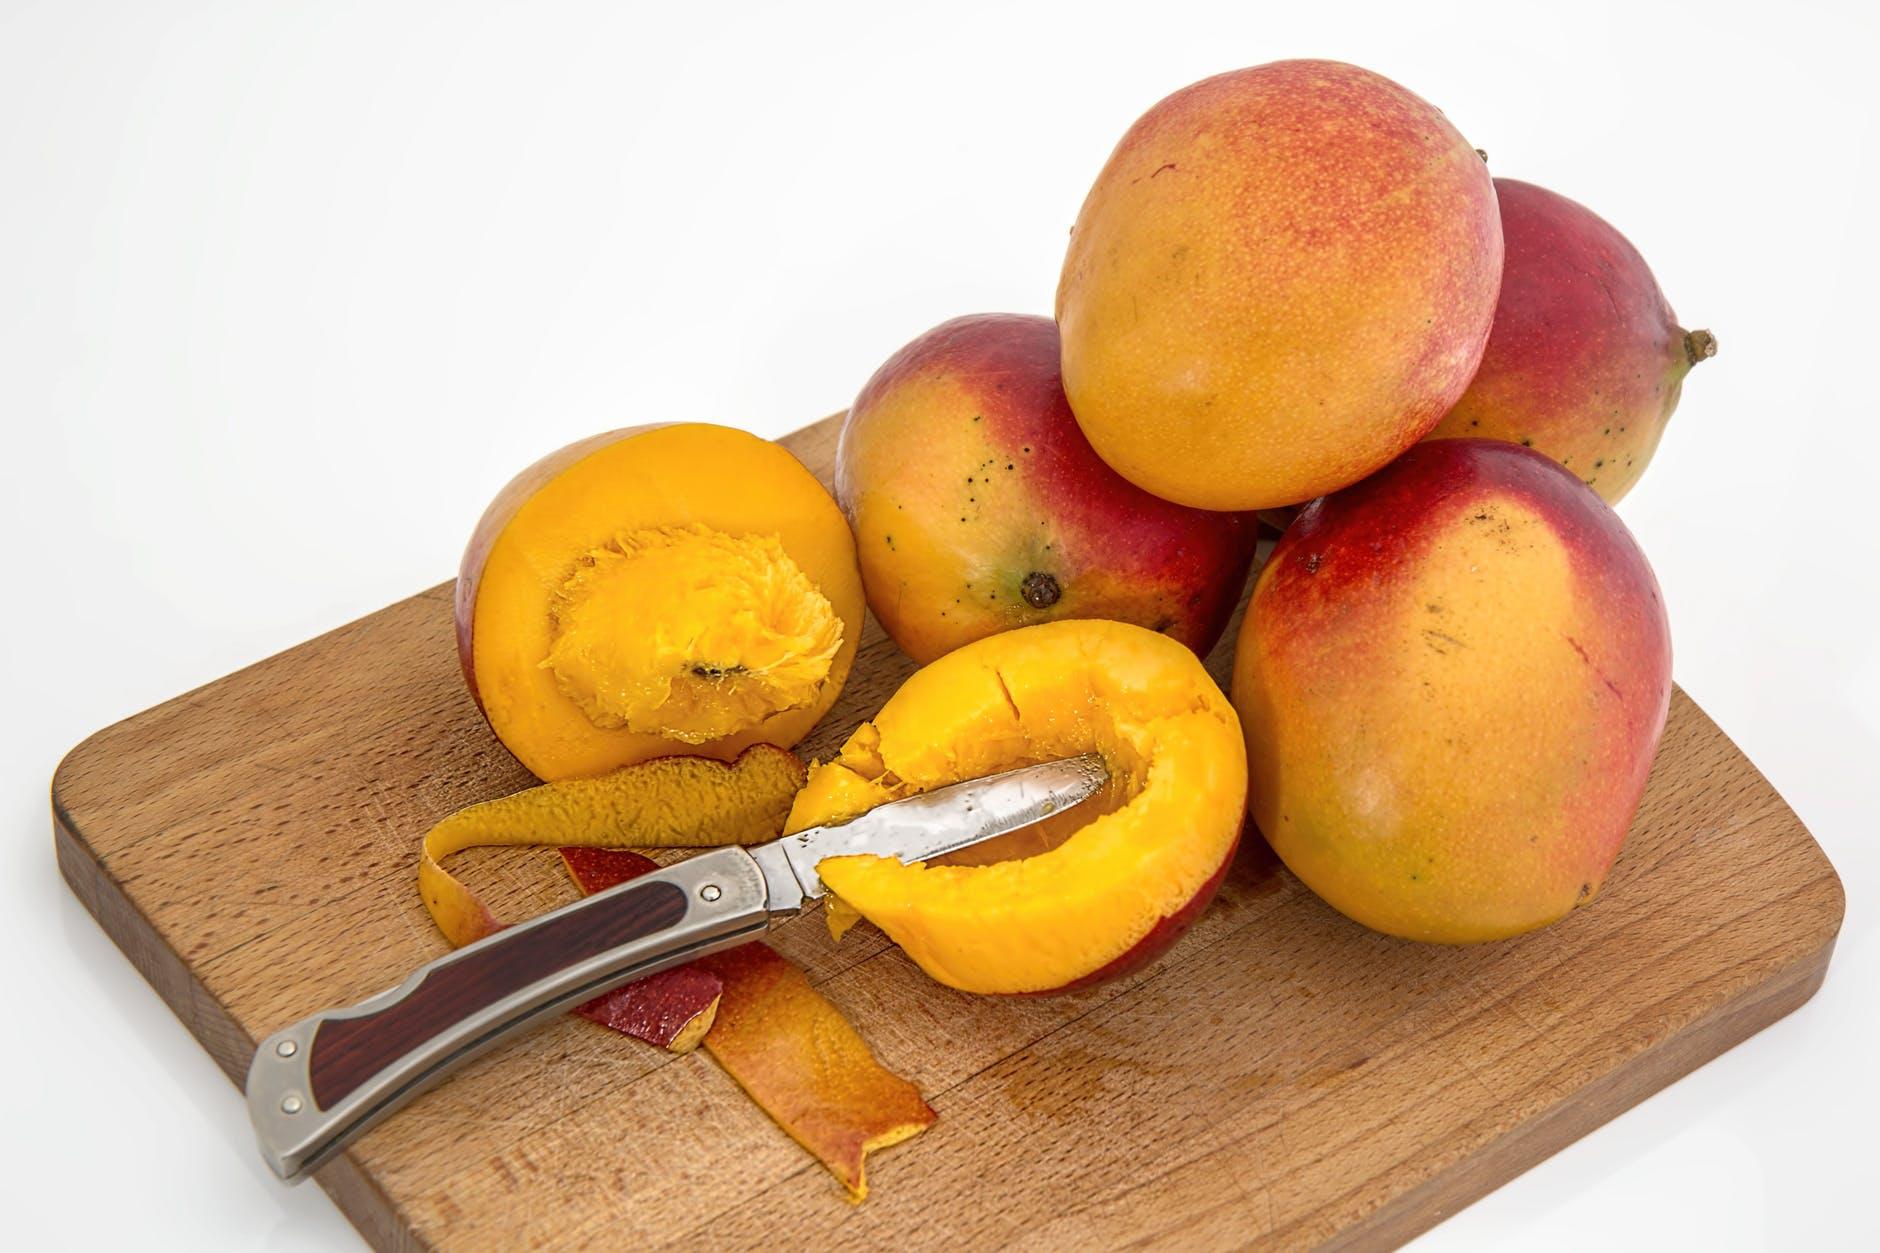 mango-tropical-fruit-juicy-sweet-39303